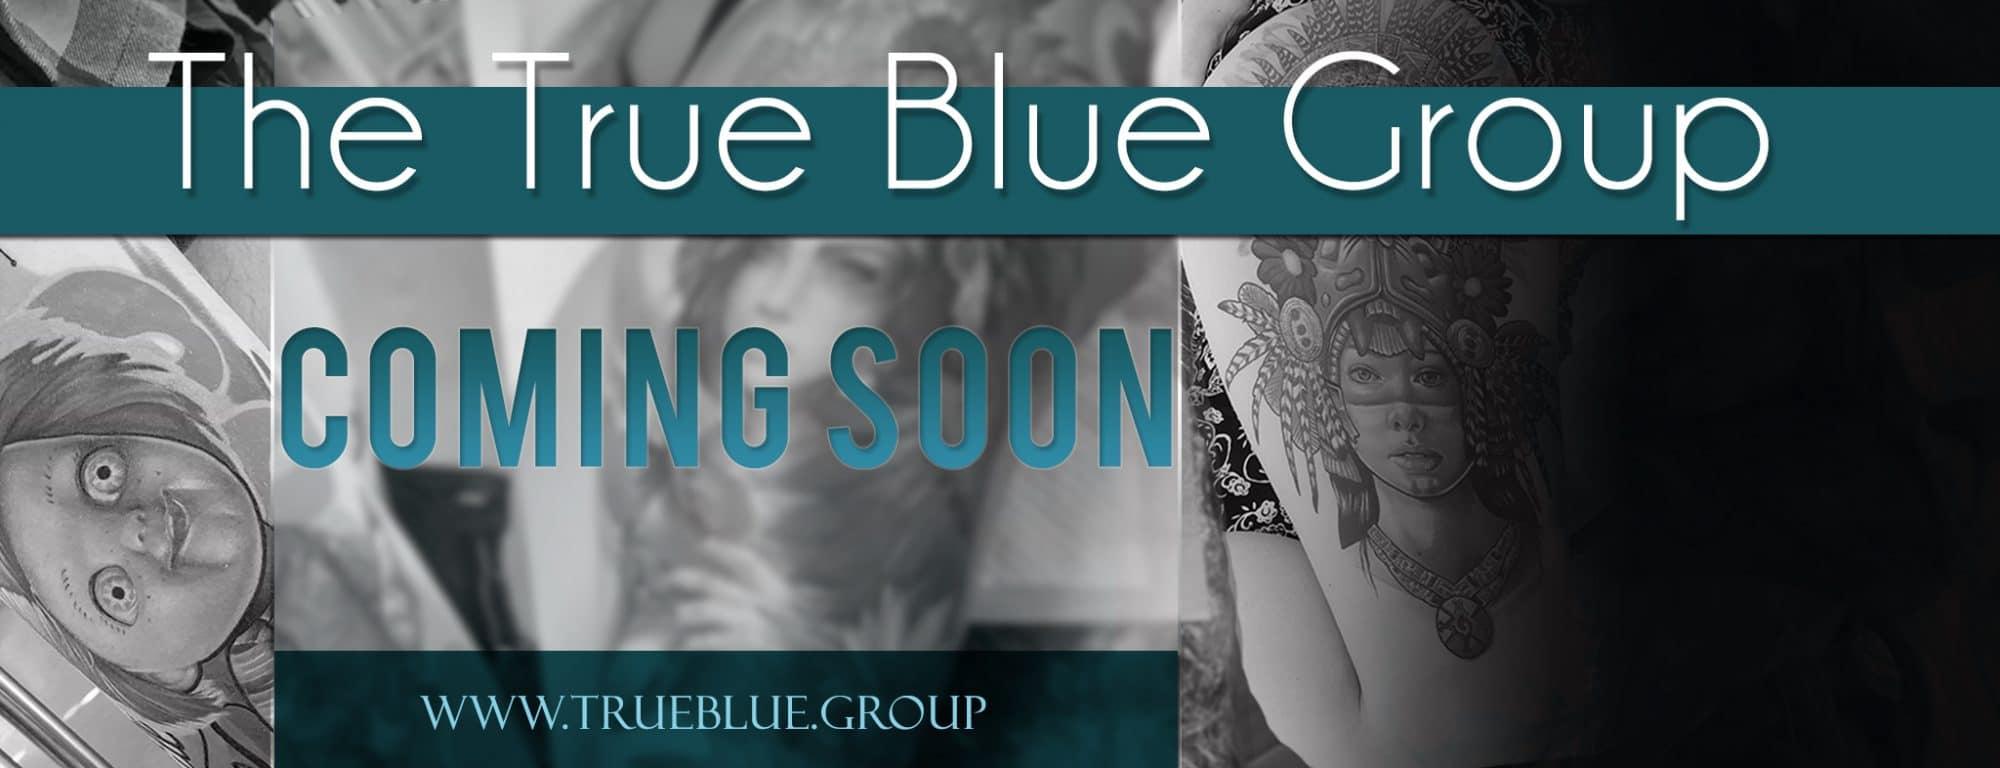 TrueBlueGroup